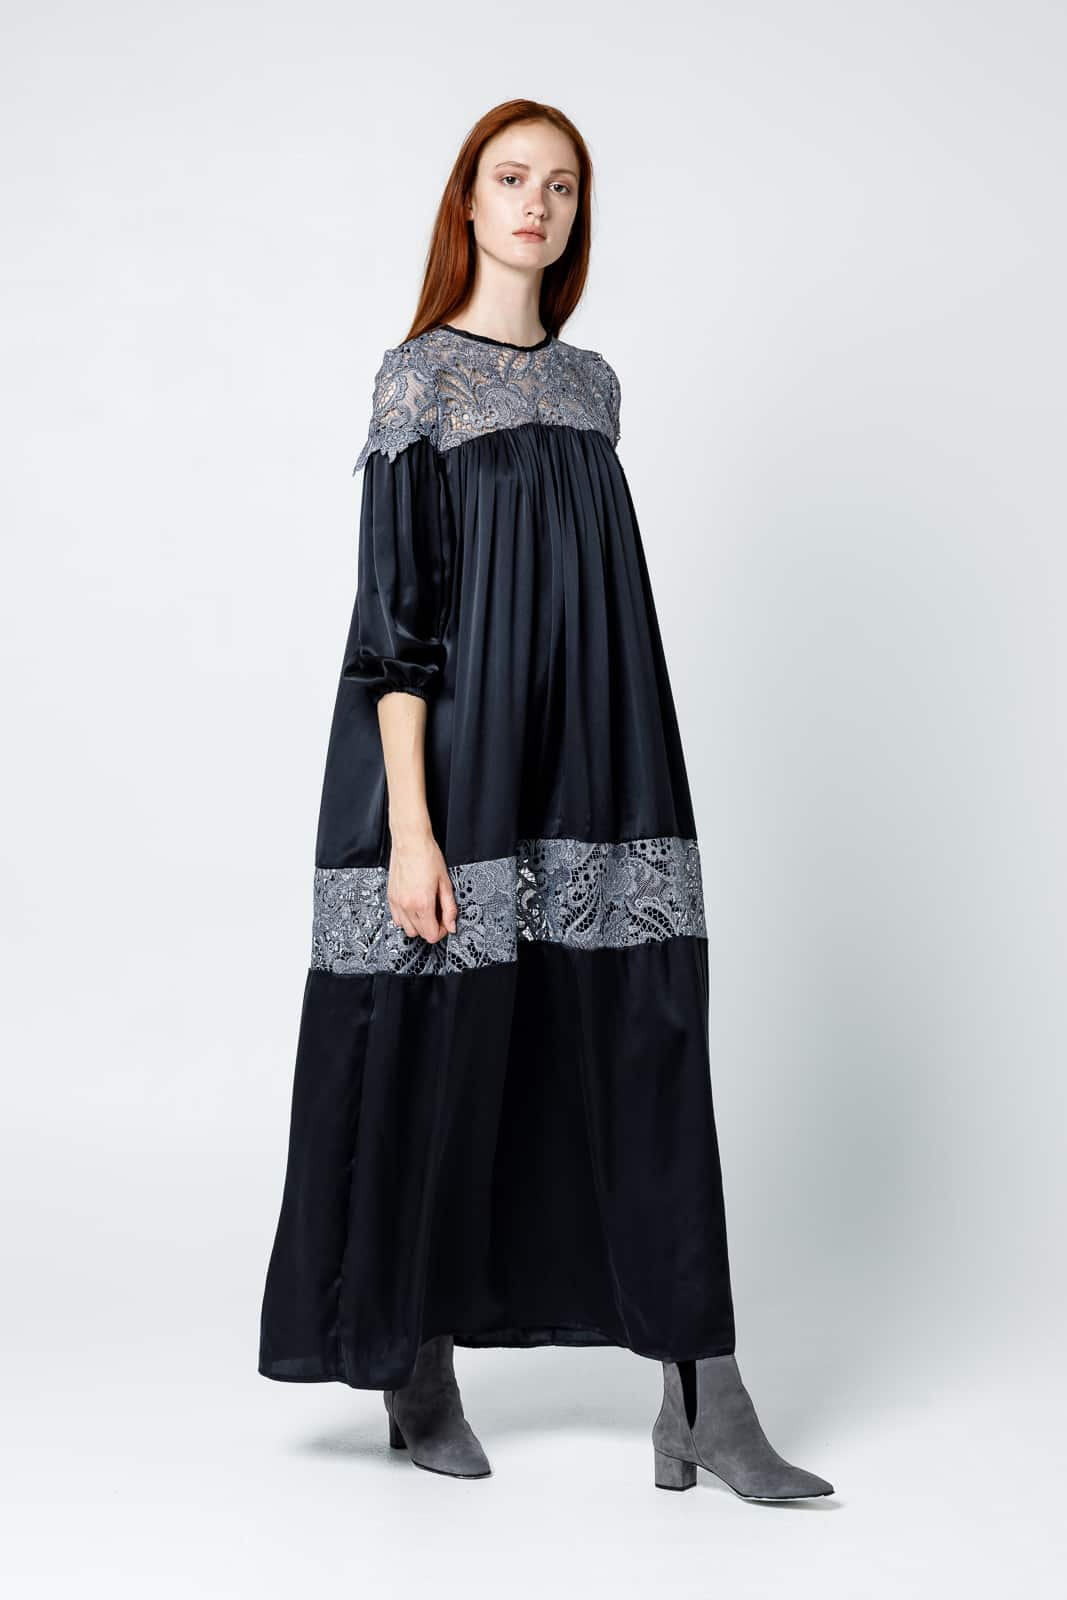 4df5ca856a Βρες τα καλύτερα επώνυμα γυναικεία ρούχα online από το ελληνικό ...